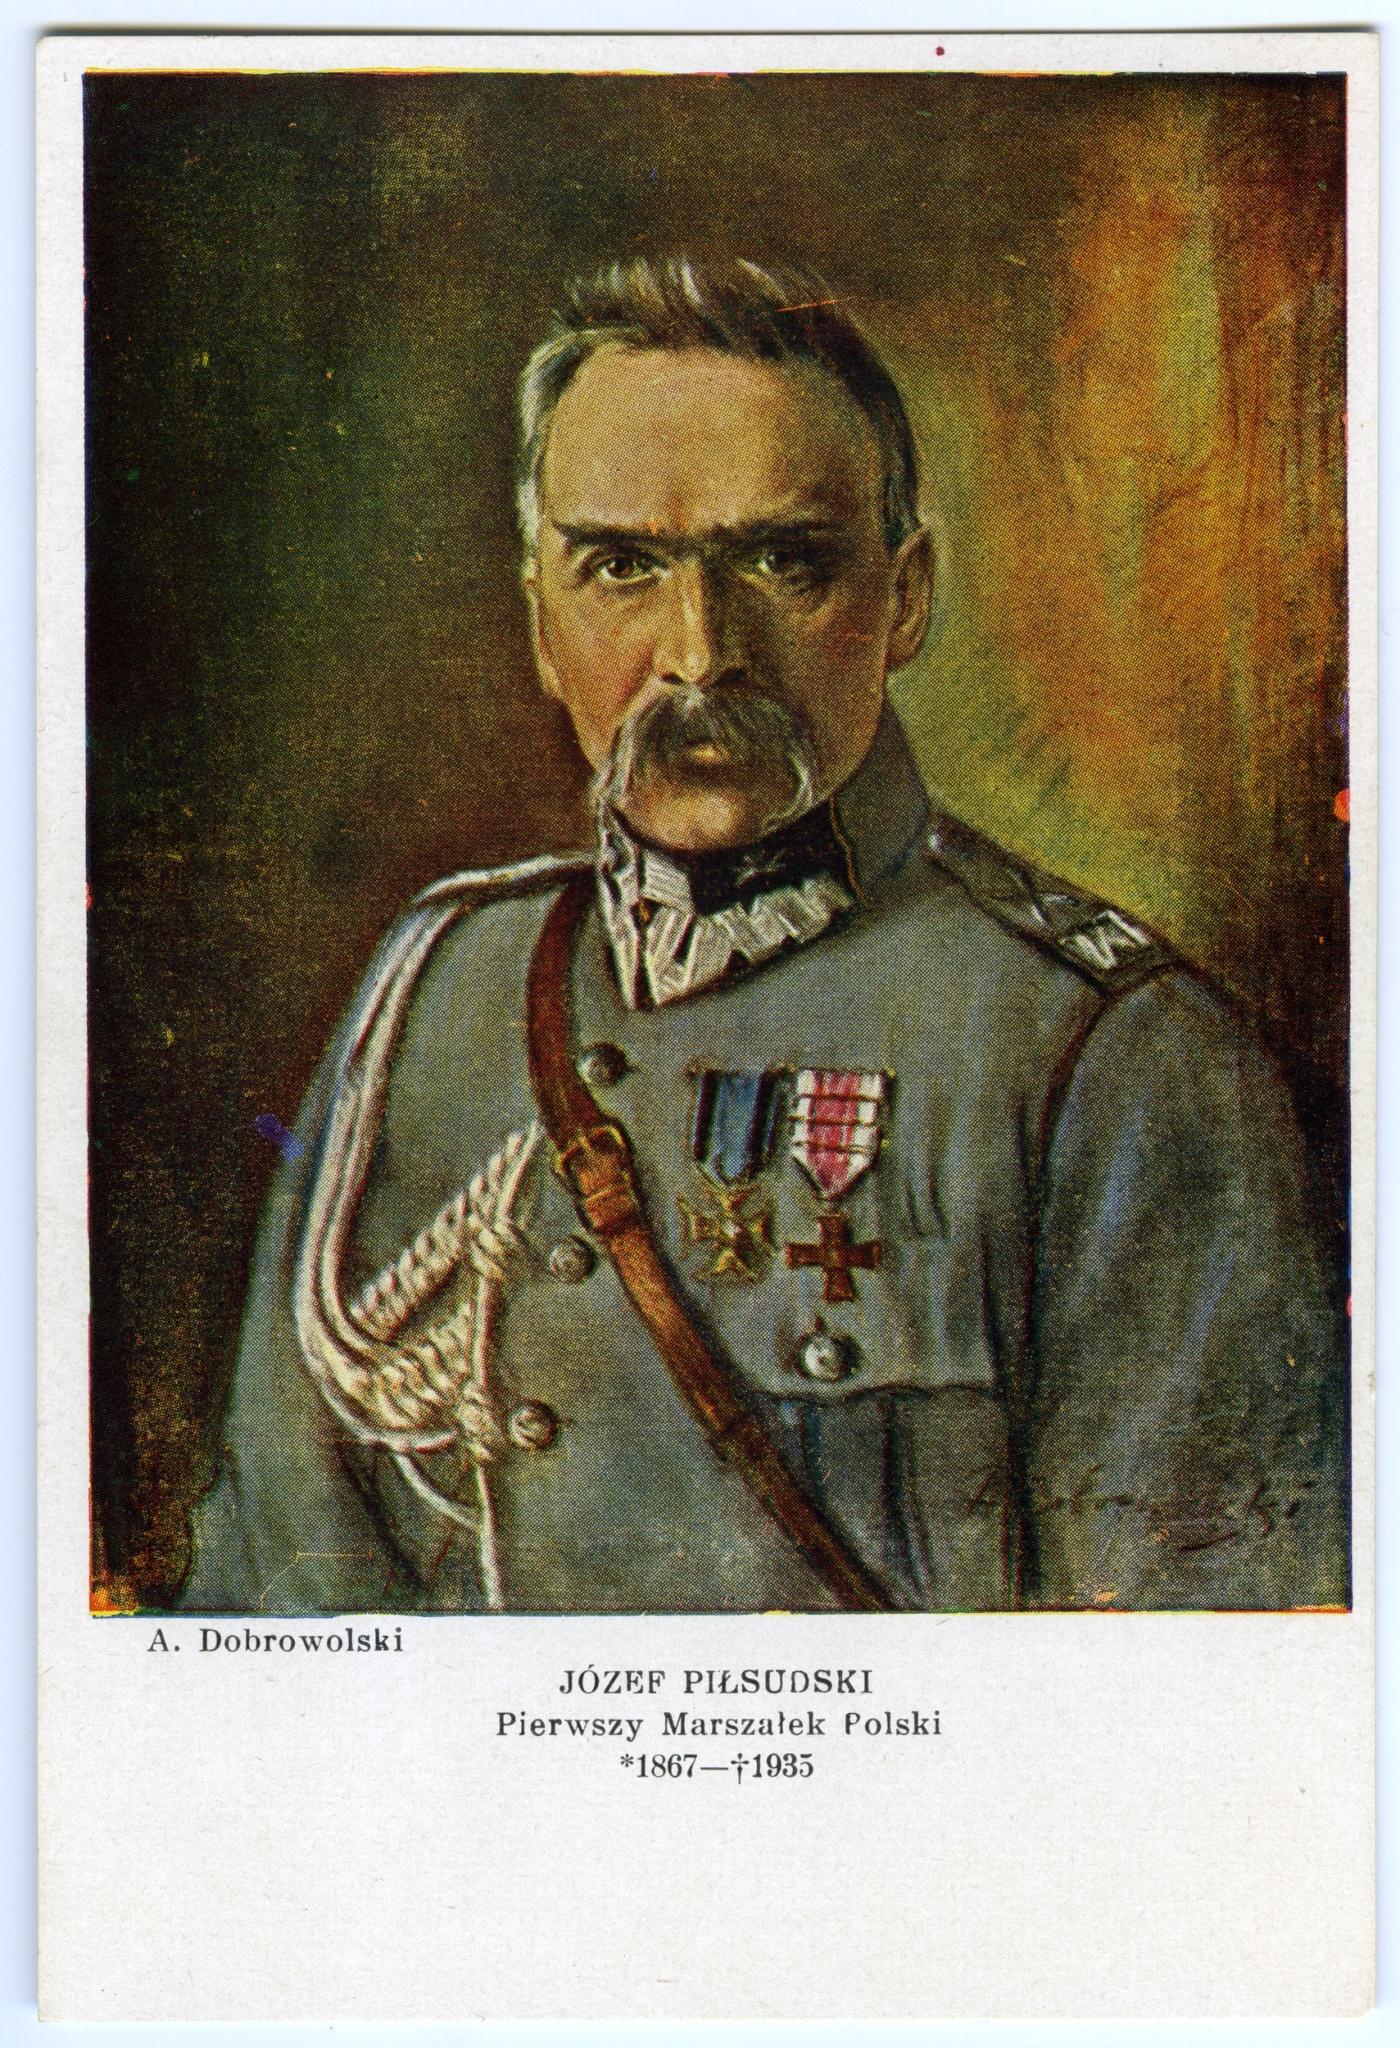 <div class='inner-box'><div class='close-desc'></div><span class='opis'>Józef Piłsudski (wg obrazu Adama Dobrowolskiego) - kartka pocztowa.</span><div class='clearfix'></div><span>Cote du document FIL03134</span><div class='clearfix'></div><span>© Instytut Literacki</span></div>